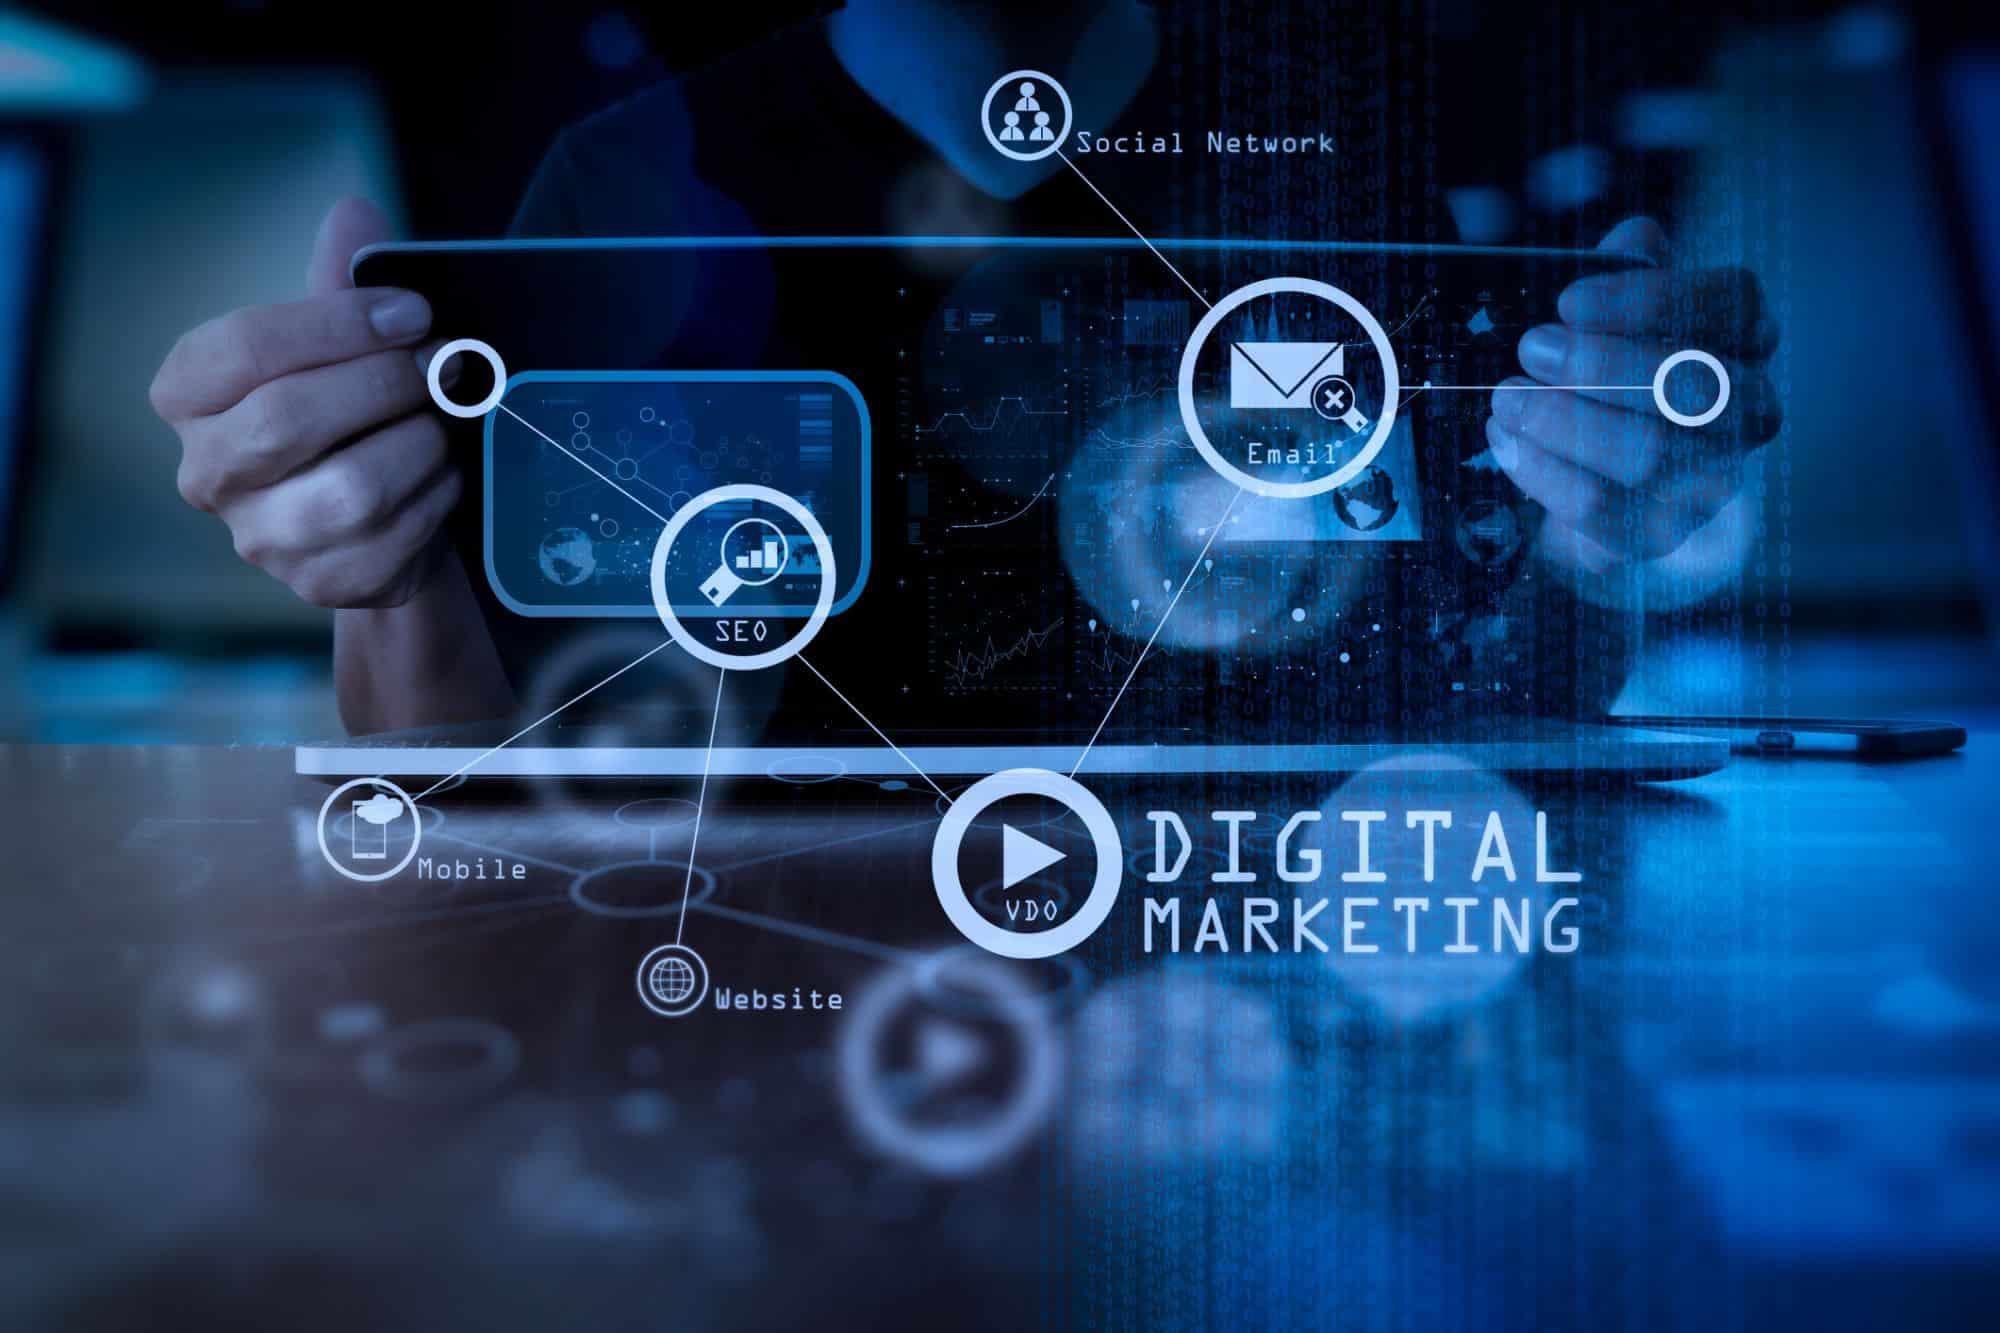 Masters in Digital Marketing in UK | MSc in Digital Marketing in UK | Study Digital  Marketing in London for Indian Students | GoUK